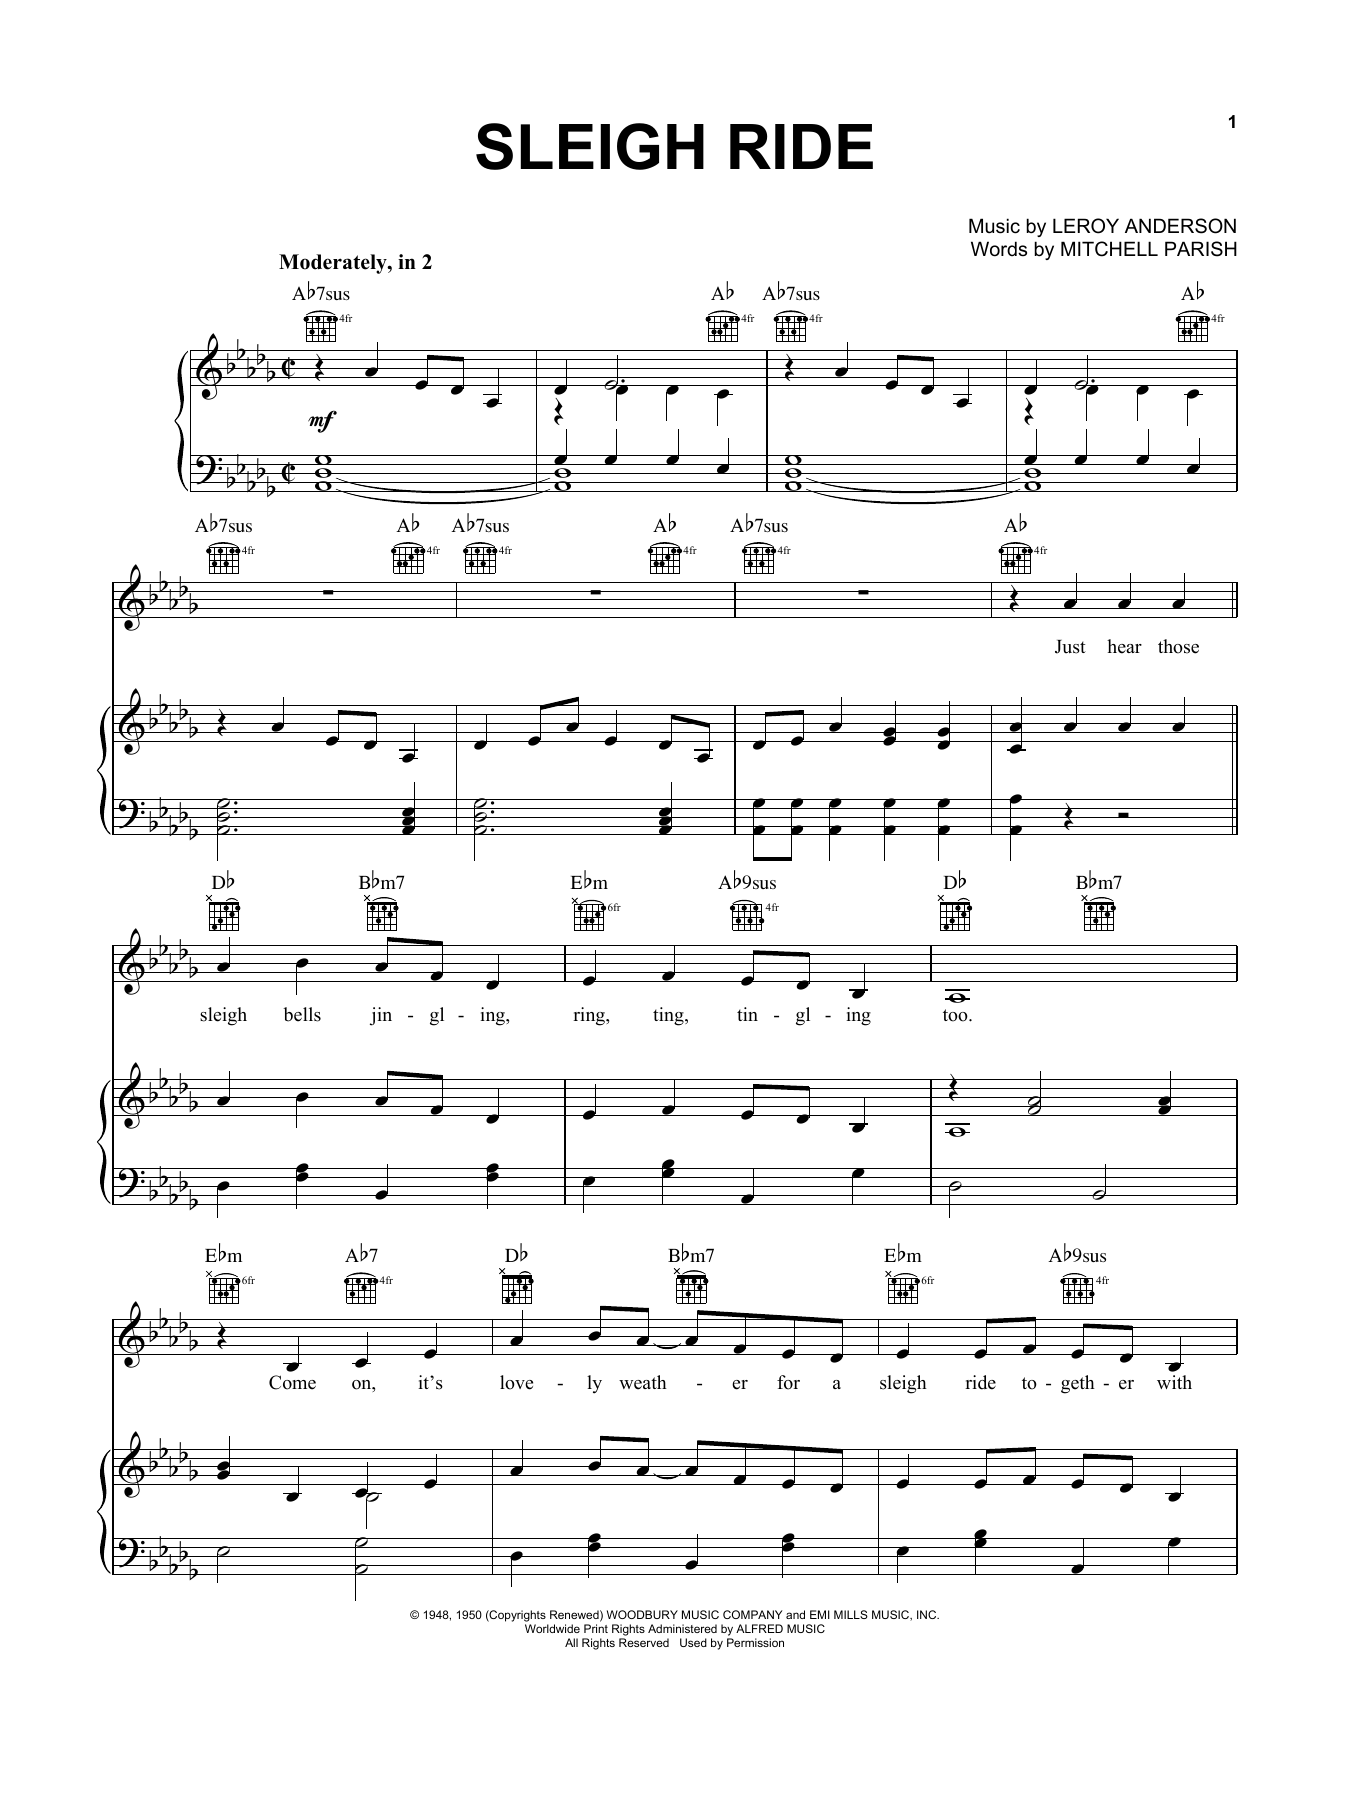 Pentatonix - Sleigh Ride